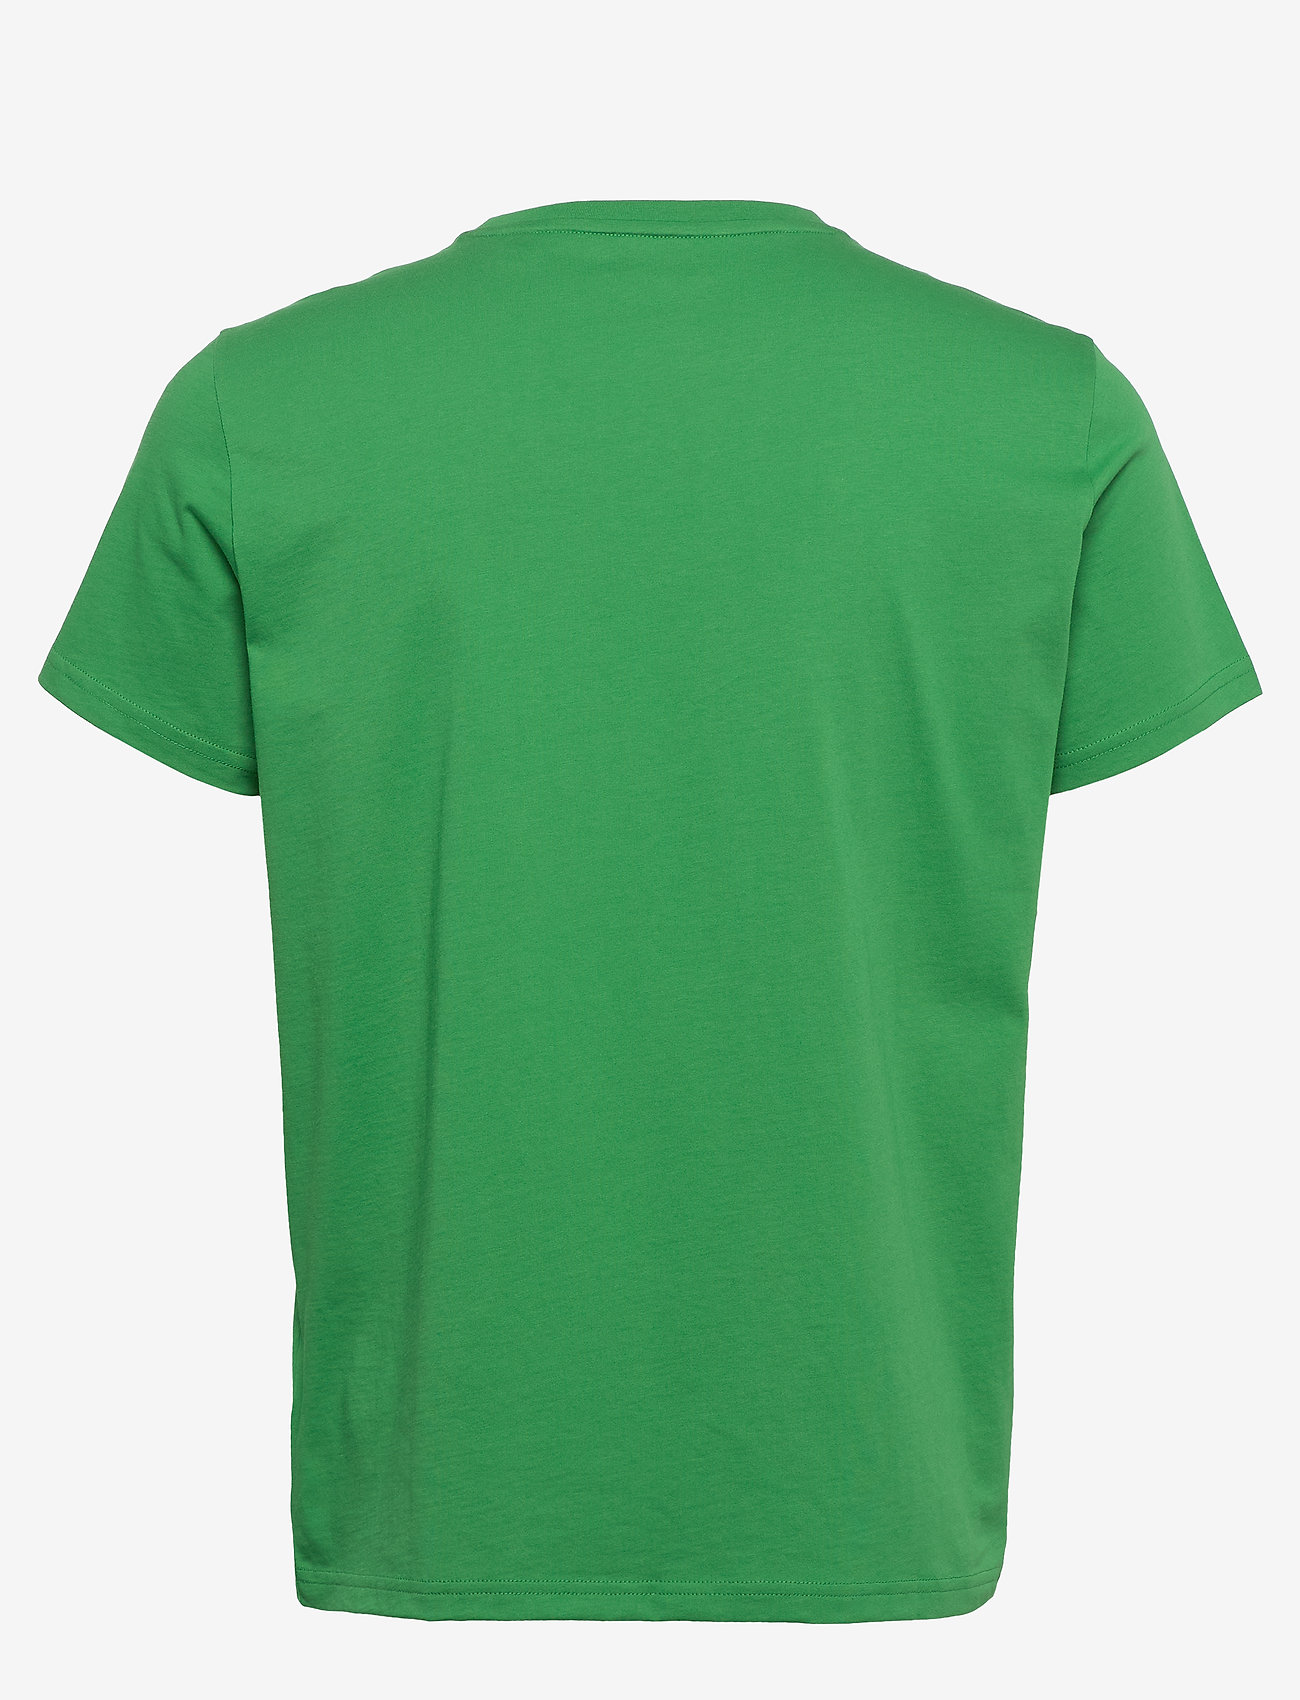 GANT - D1. COLOR LOCK UP SS T-SHIRT - short-sleeved t-shirts - amazon green - 1